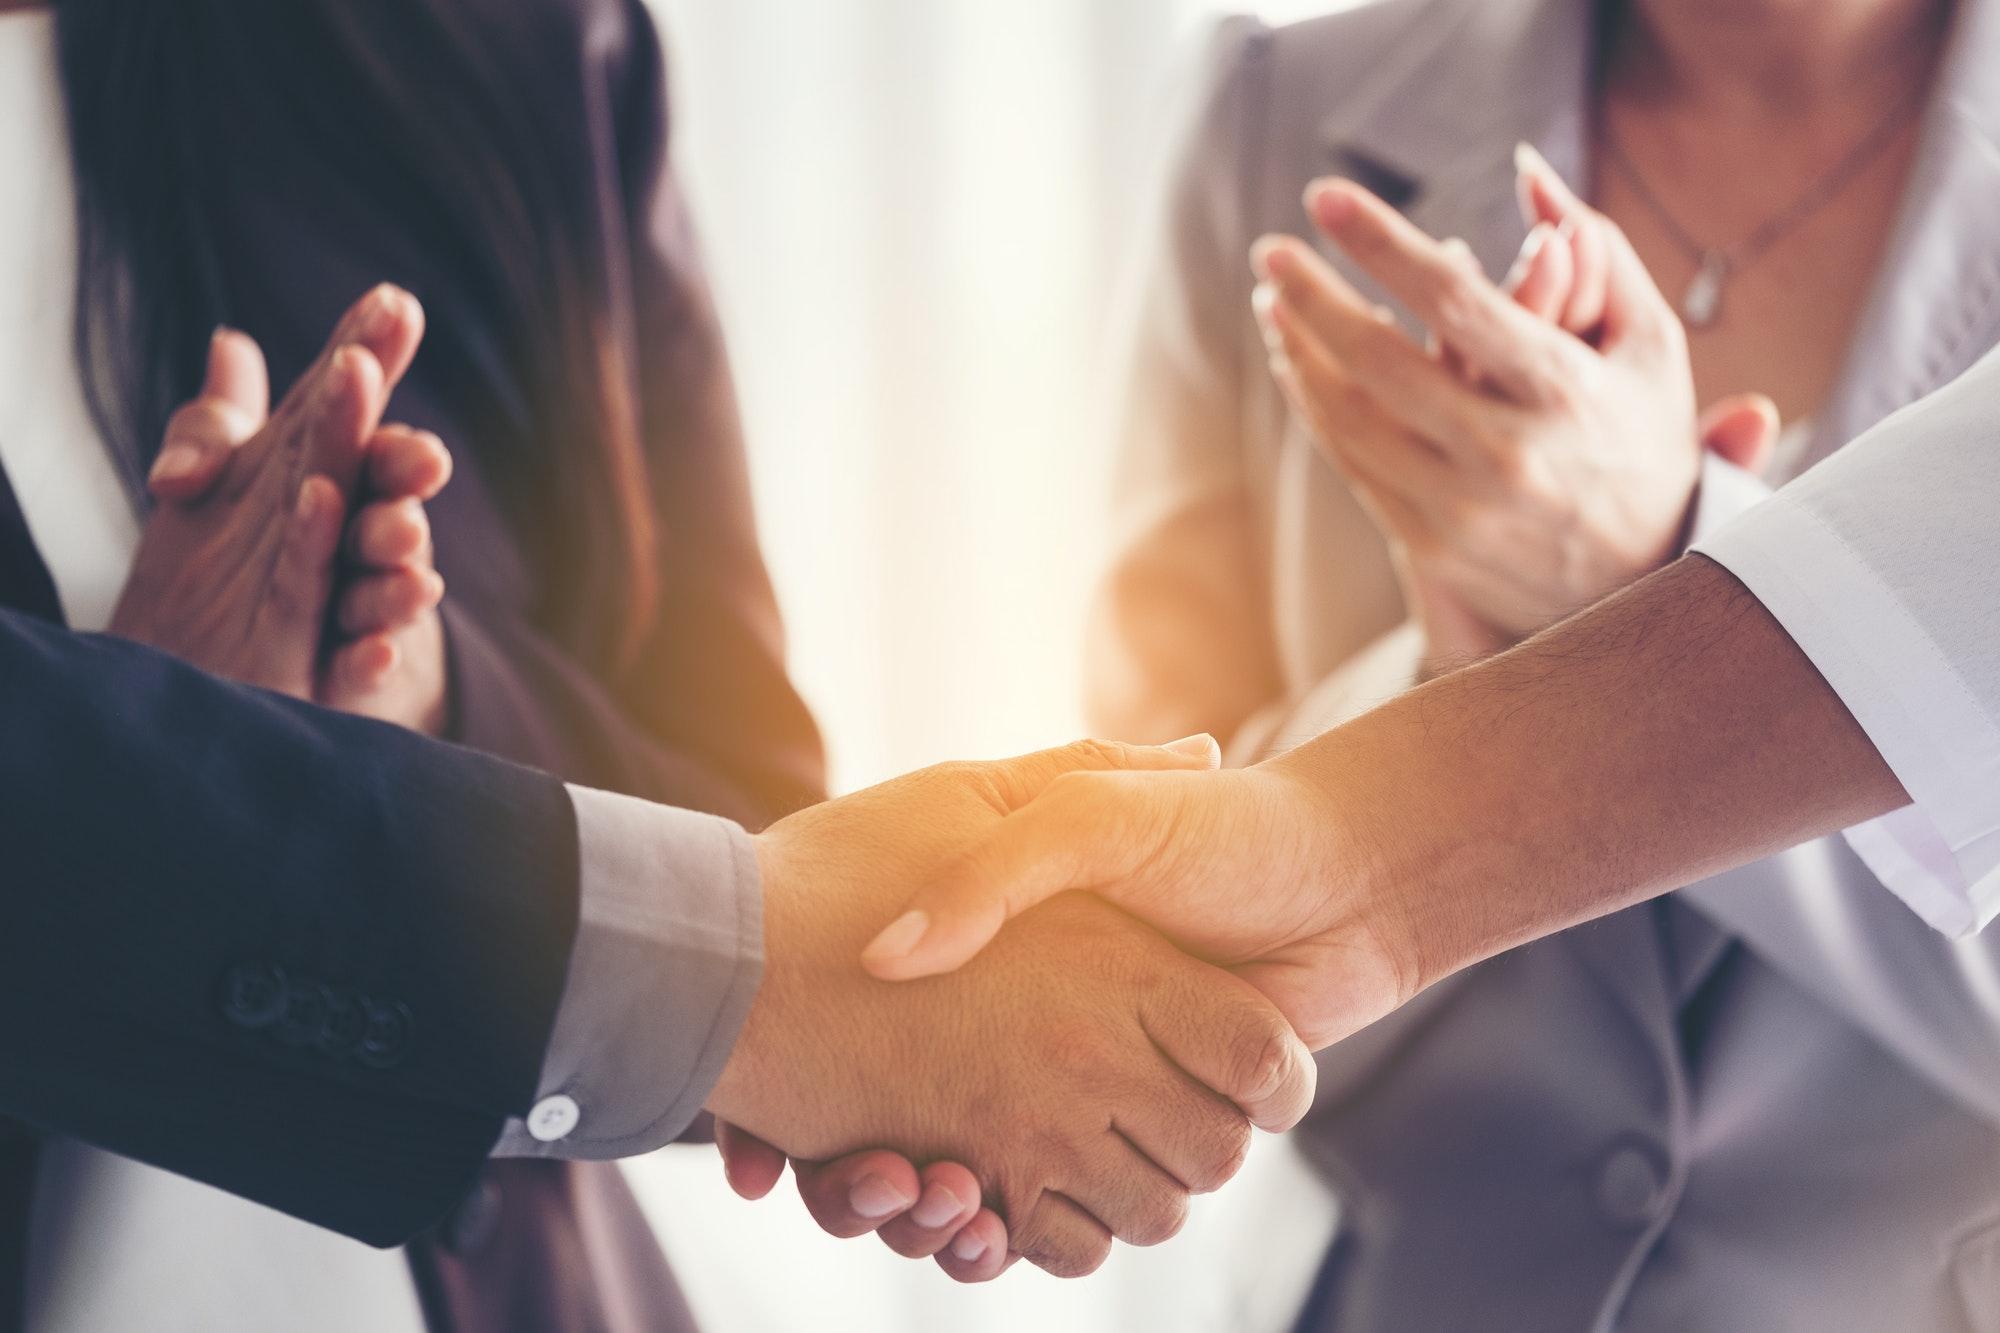 Businessmen making handshake in the city - business etiquette